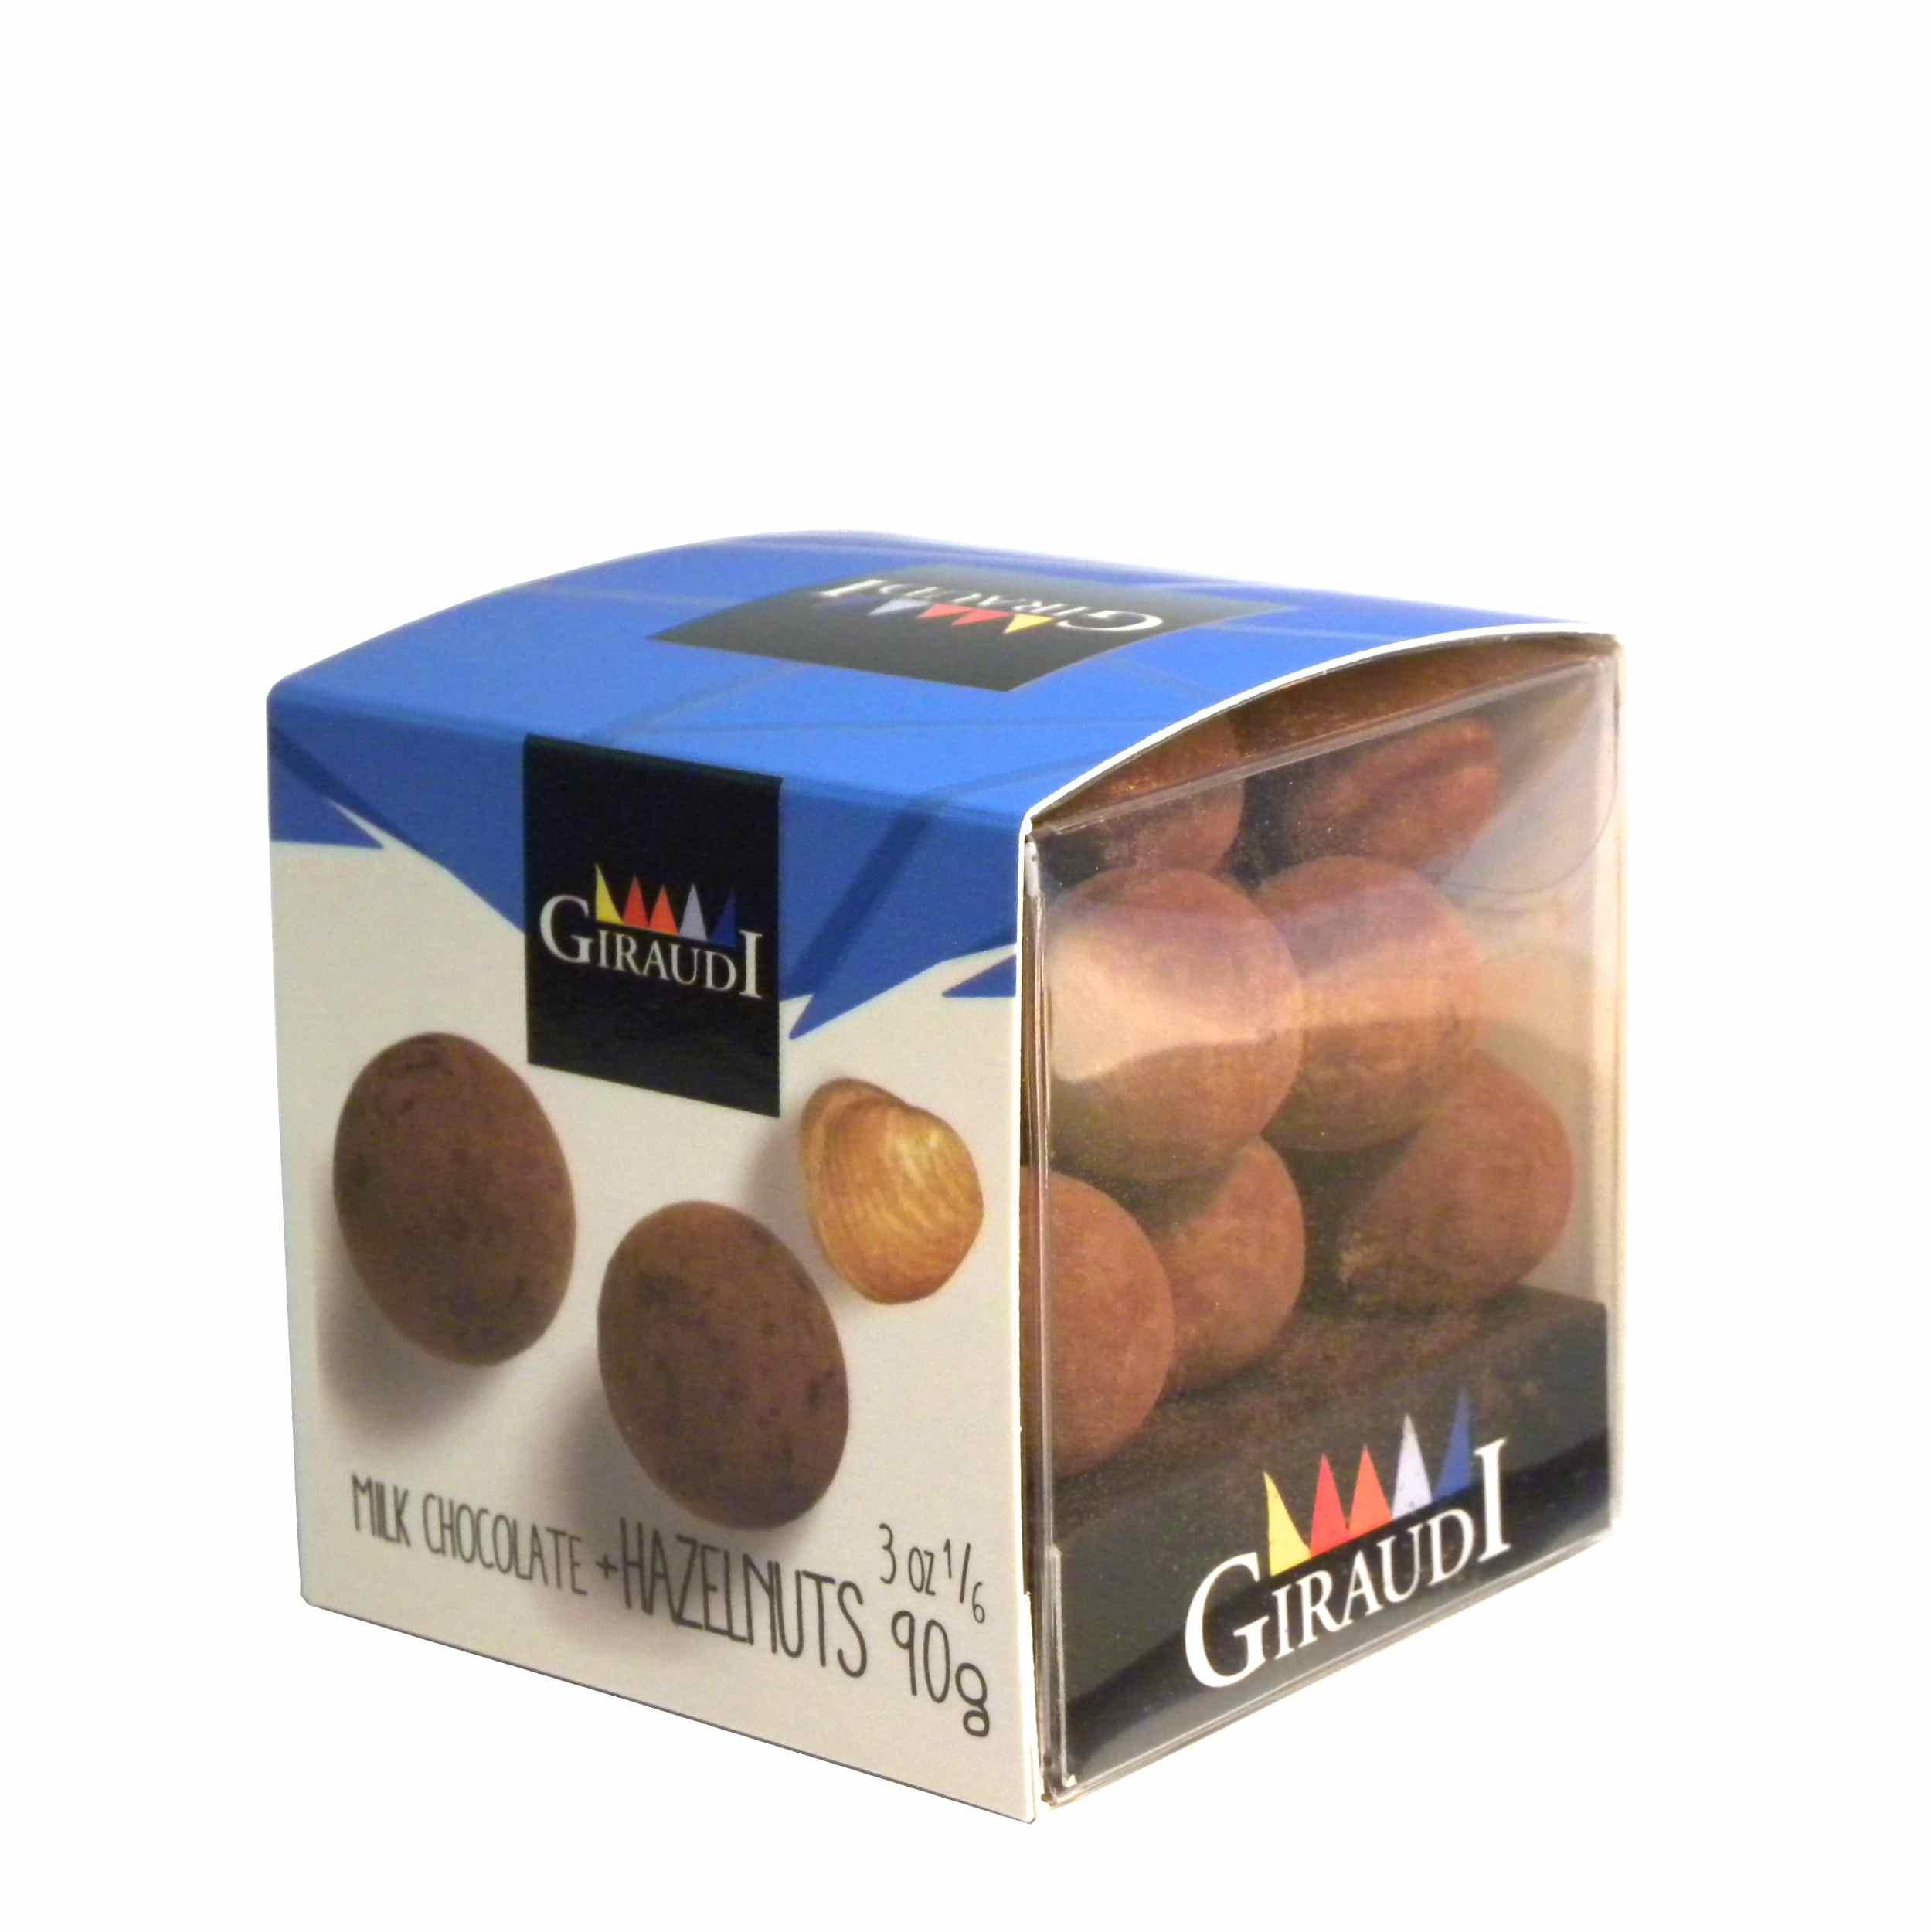 Giraudi milk chocolate hazelnuts – Giraudi dragee cioccolato latte nocciole – Gustorotondo – Italian food boutique